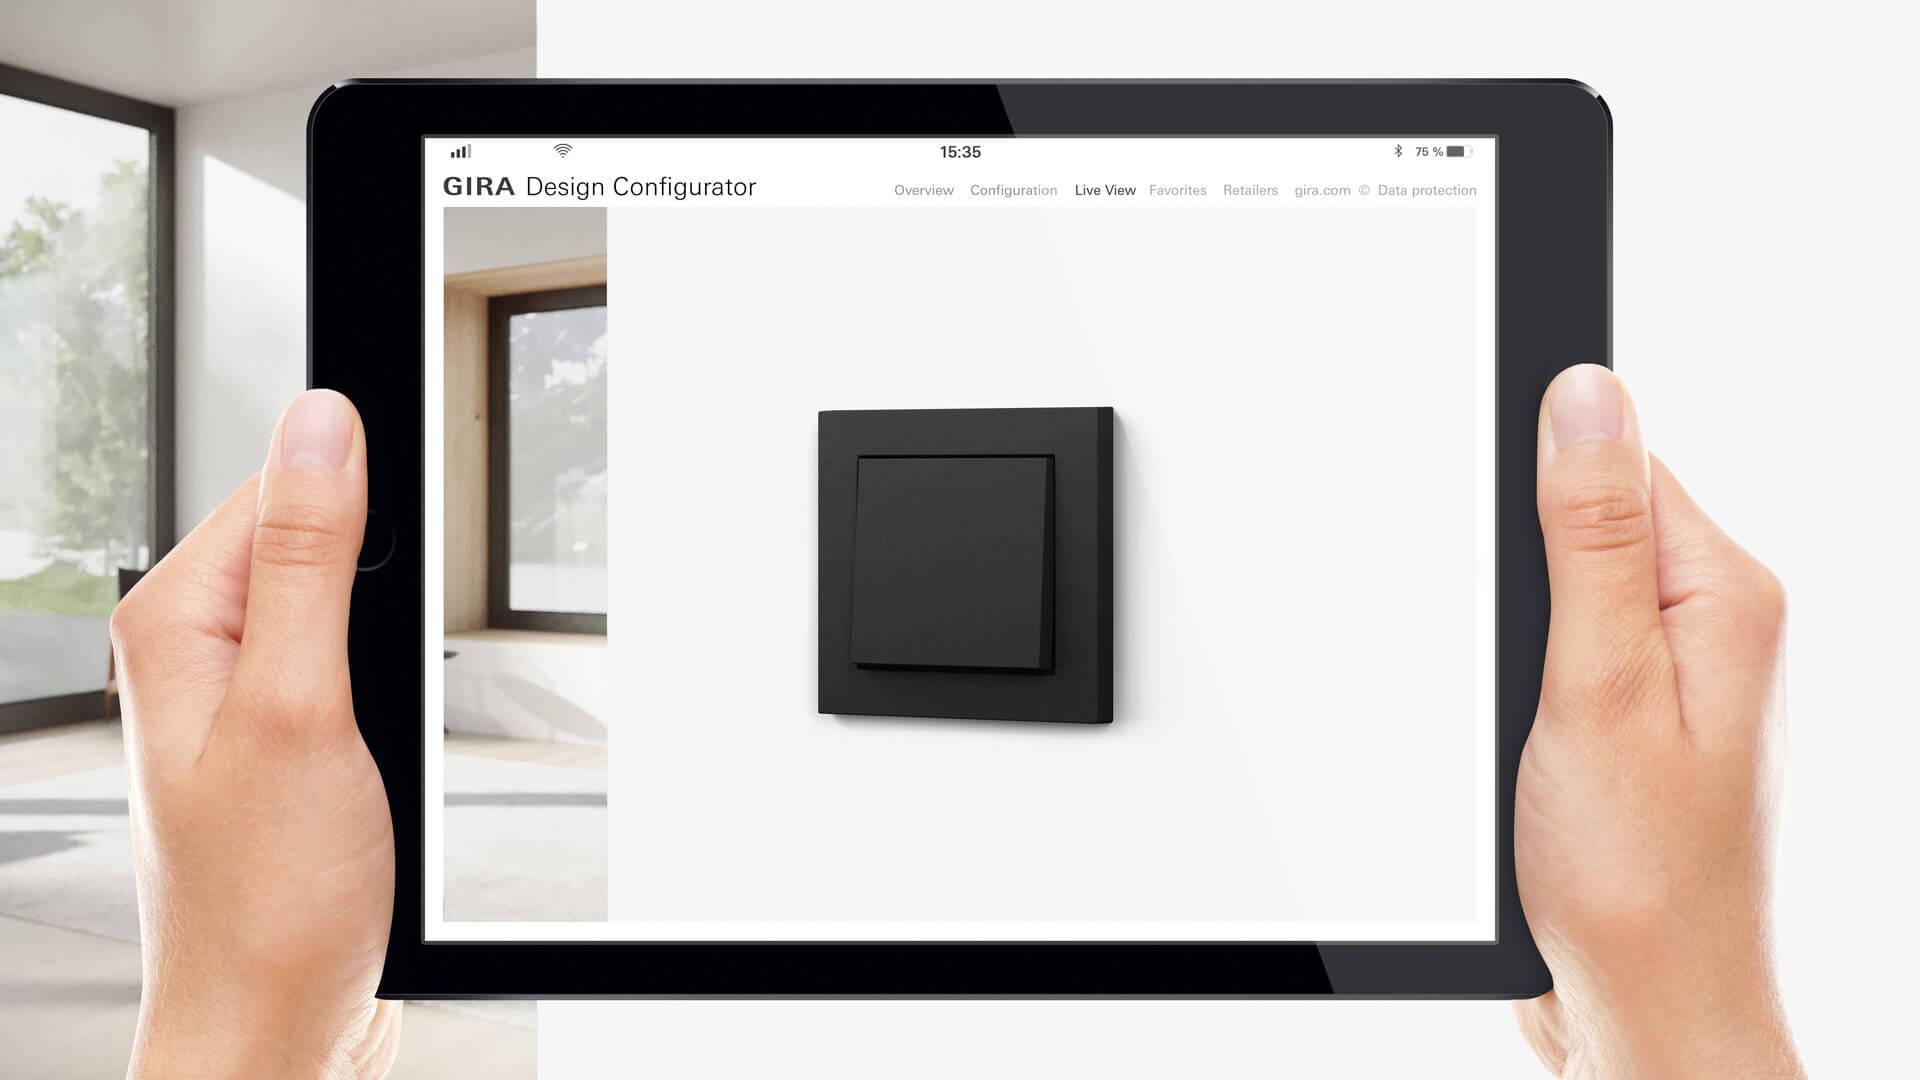 Gira design configurator